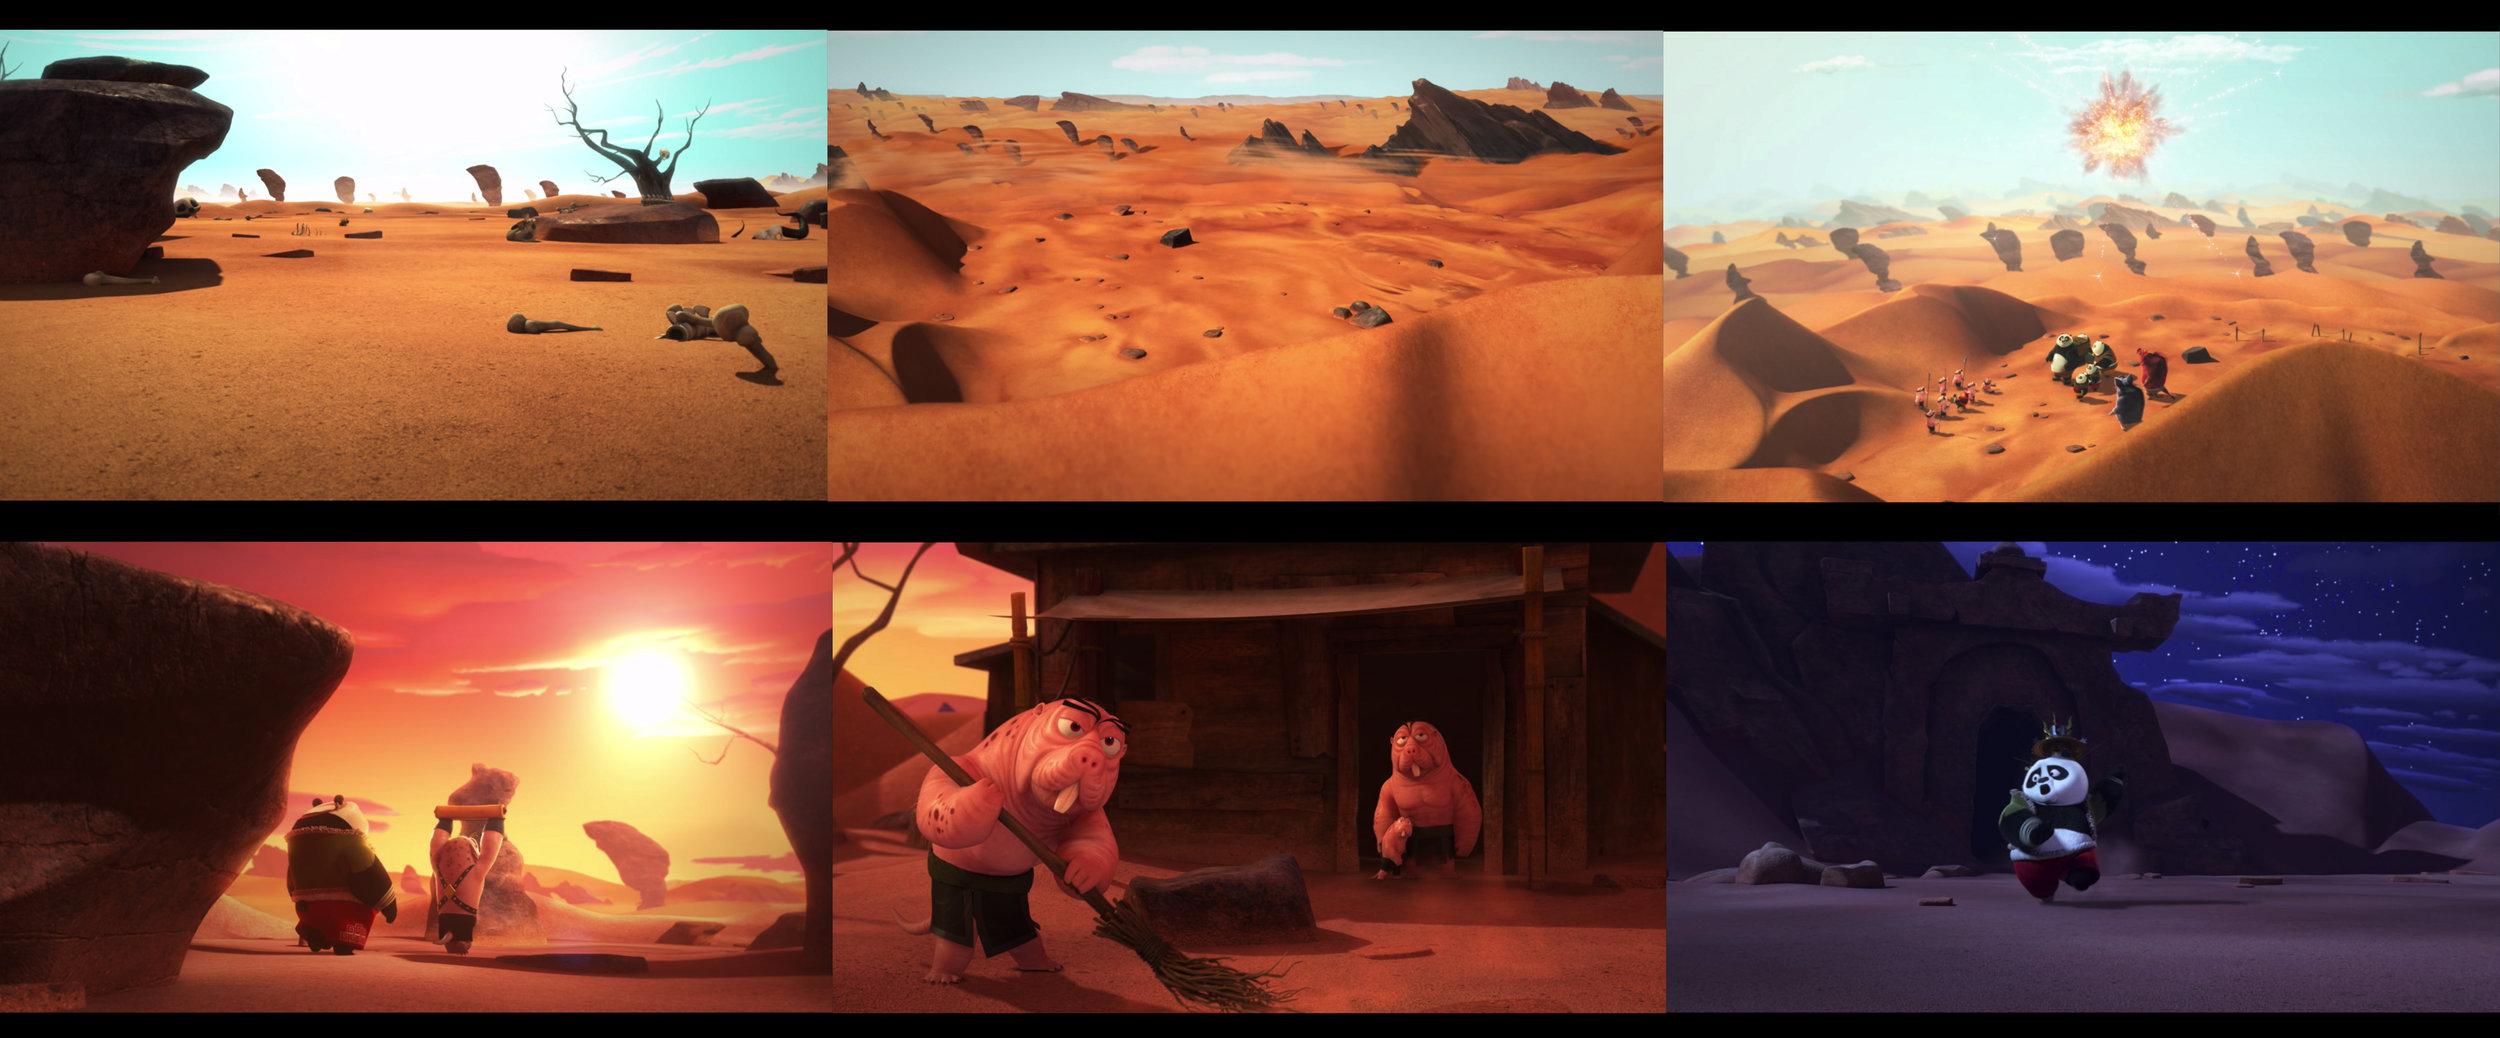 KFV_Wasteland_Screenshots.jpg